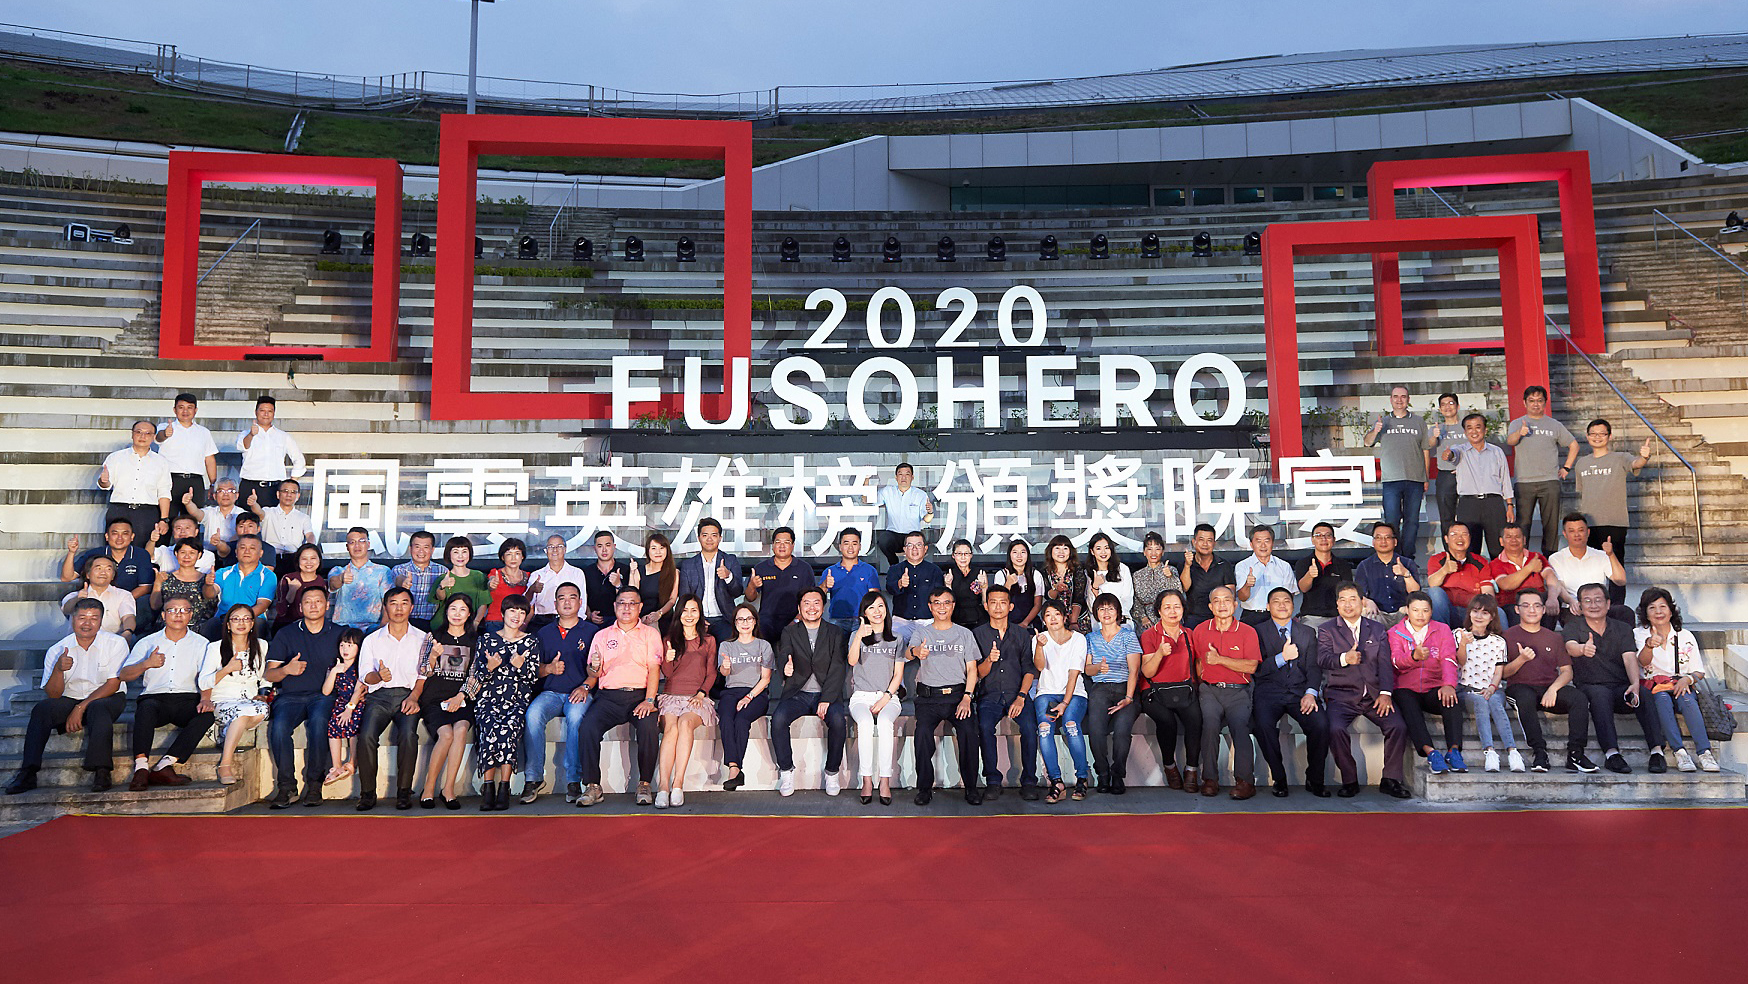 2020 Fuso Hero 頒獎晚宴高雄重磅舉行,大方送出五噸商用車